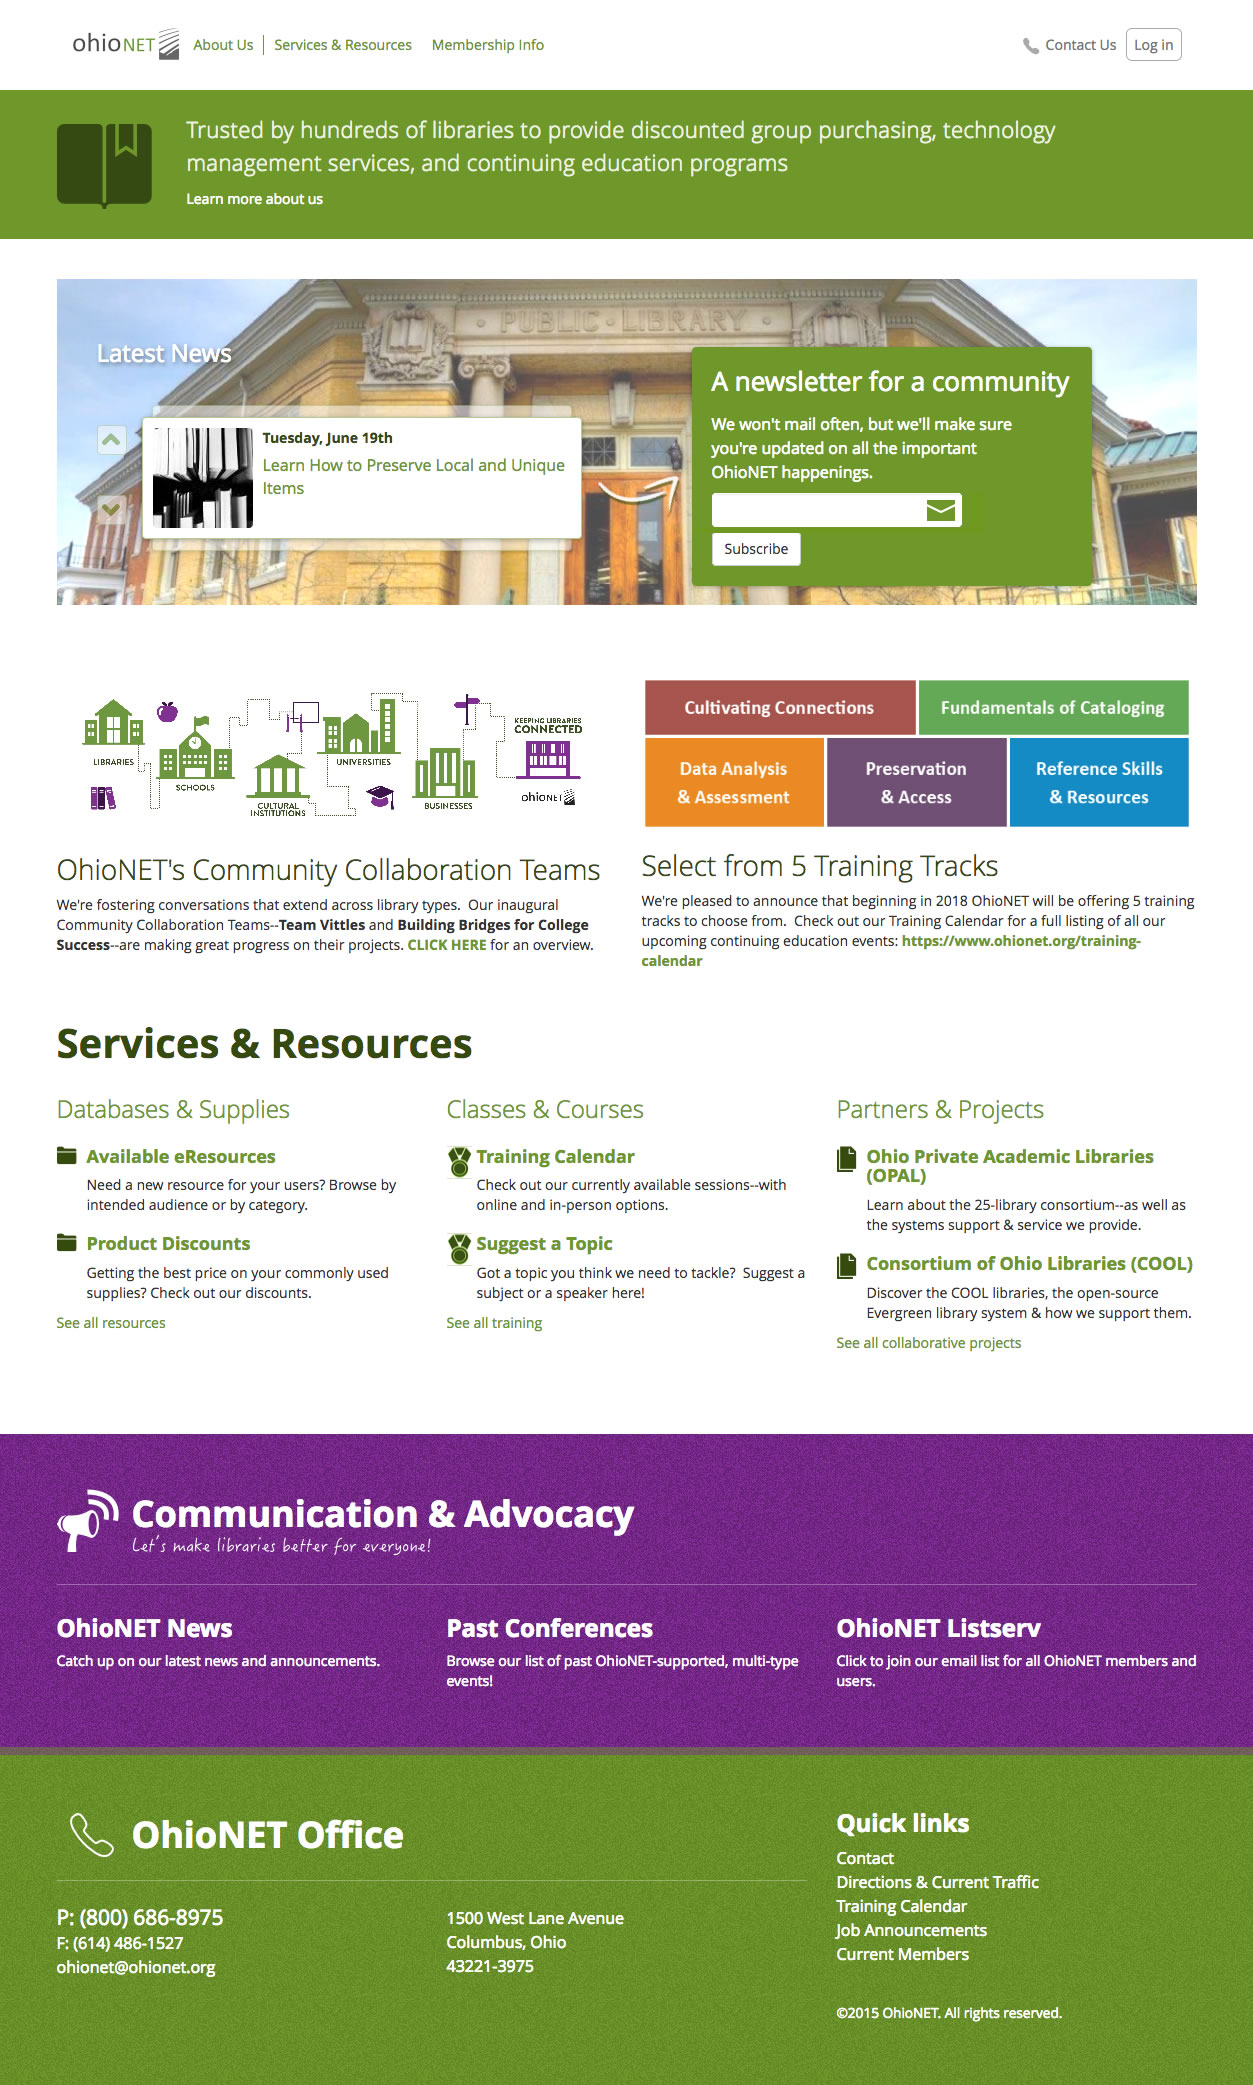 OhioNET web site screenshot